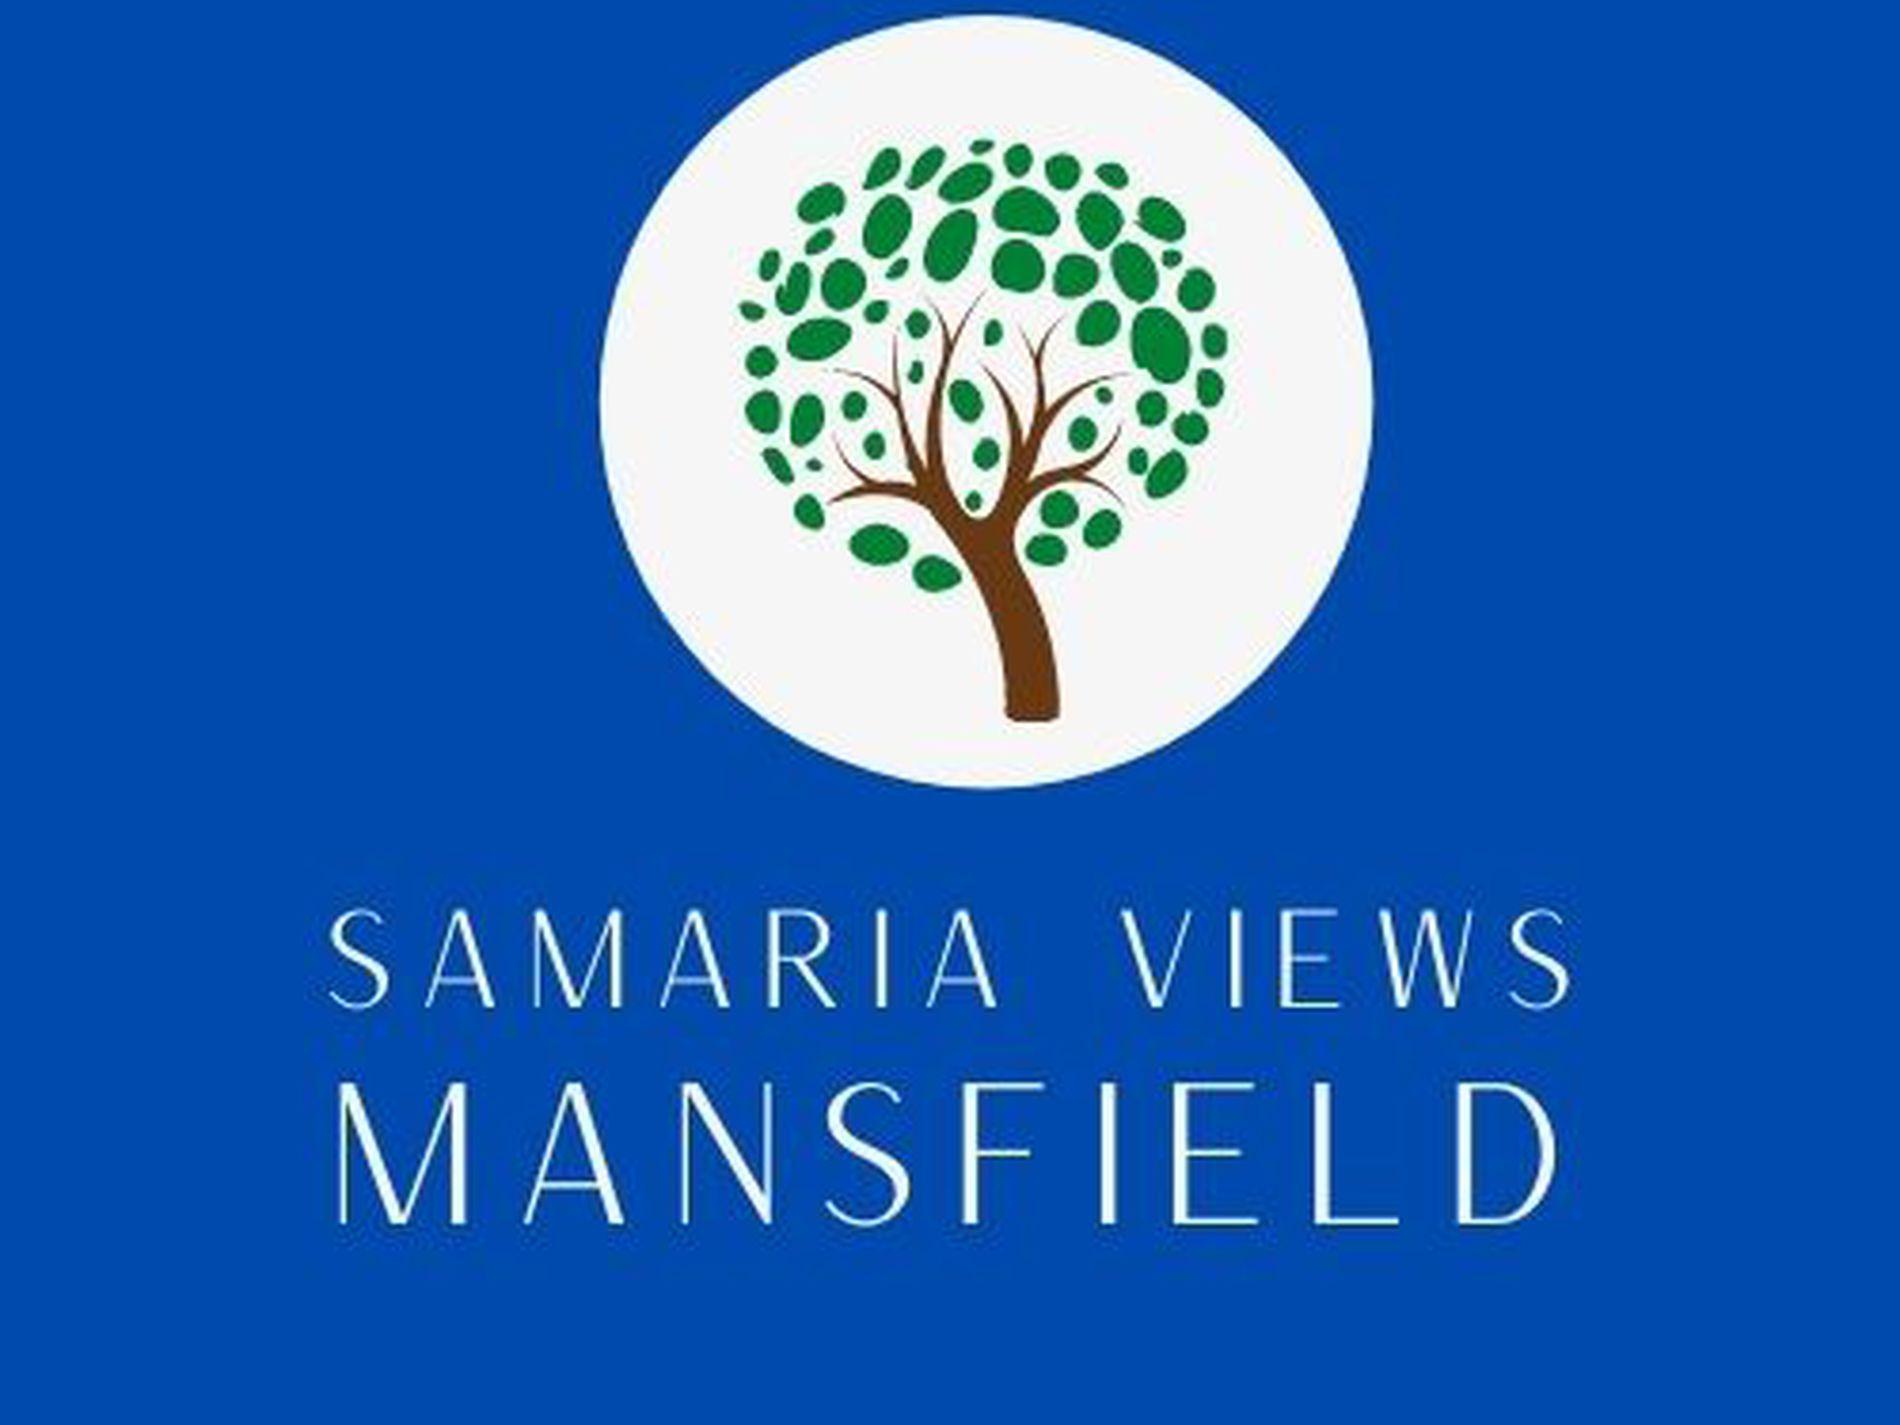 Lot 112, Samaria Views, Mansfield